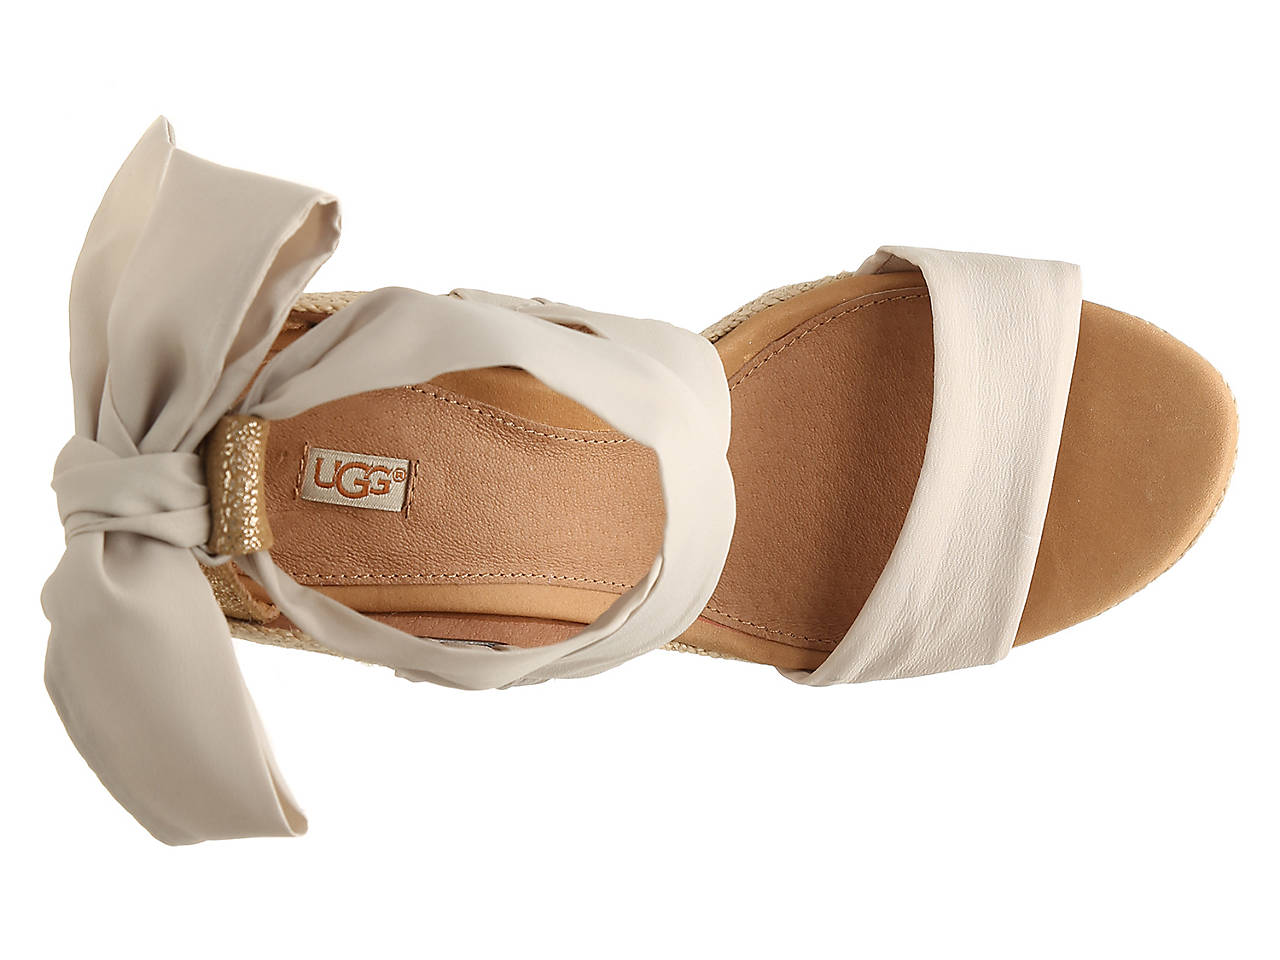 f770e0ebc73 UGG Jules Wedge Sandal Women s Shoes